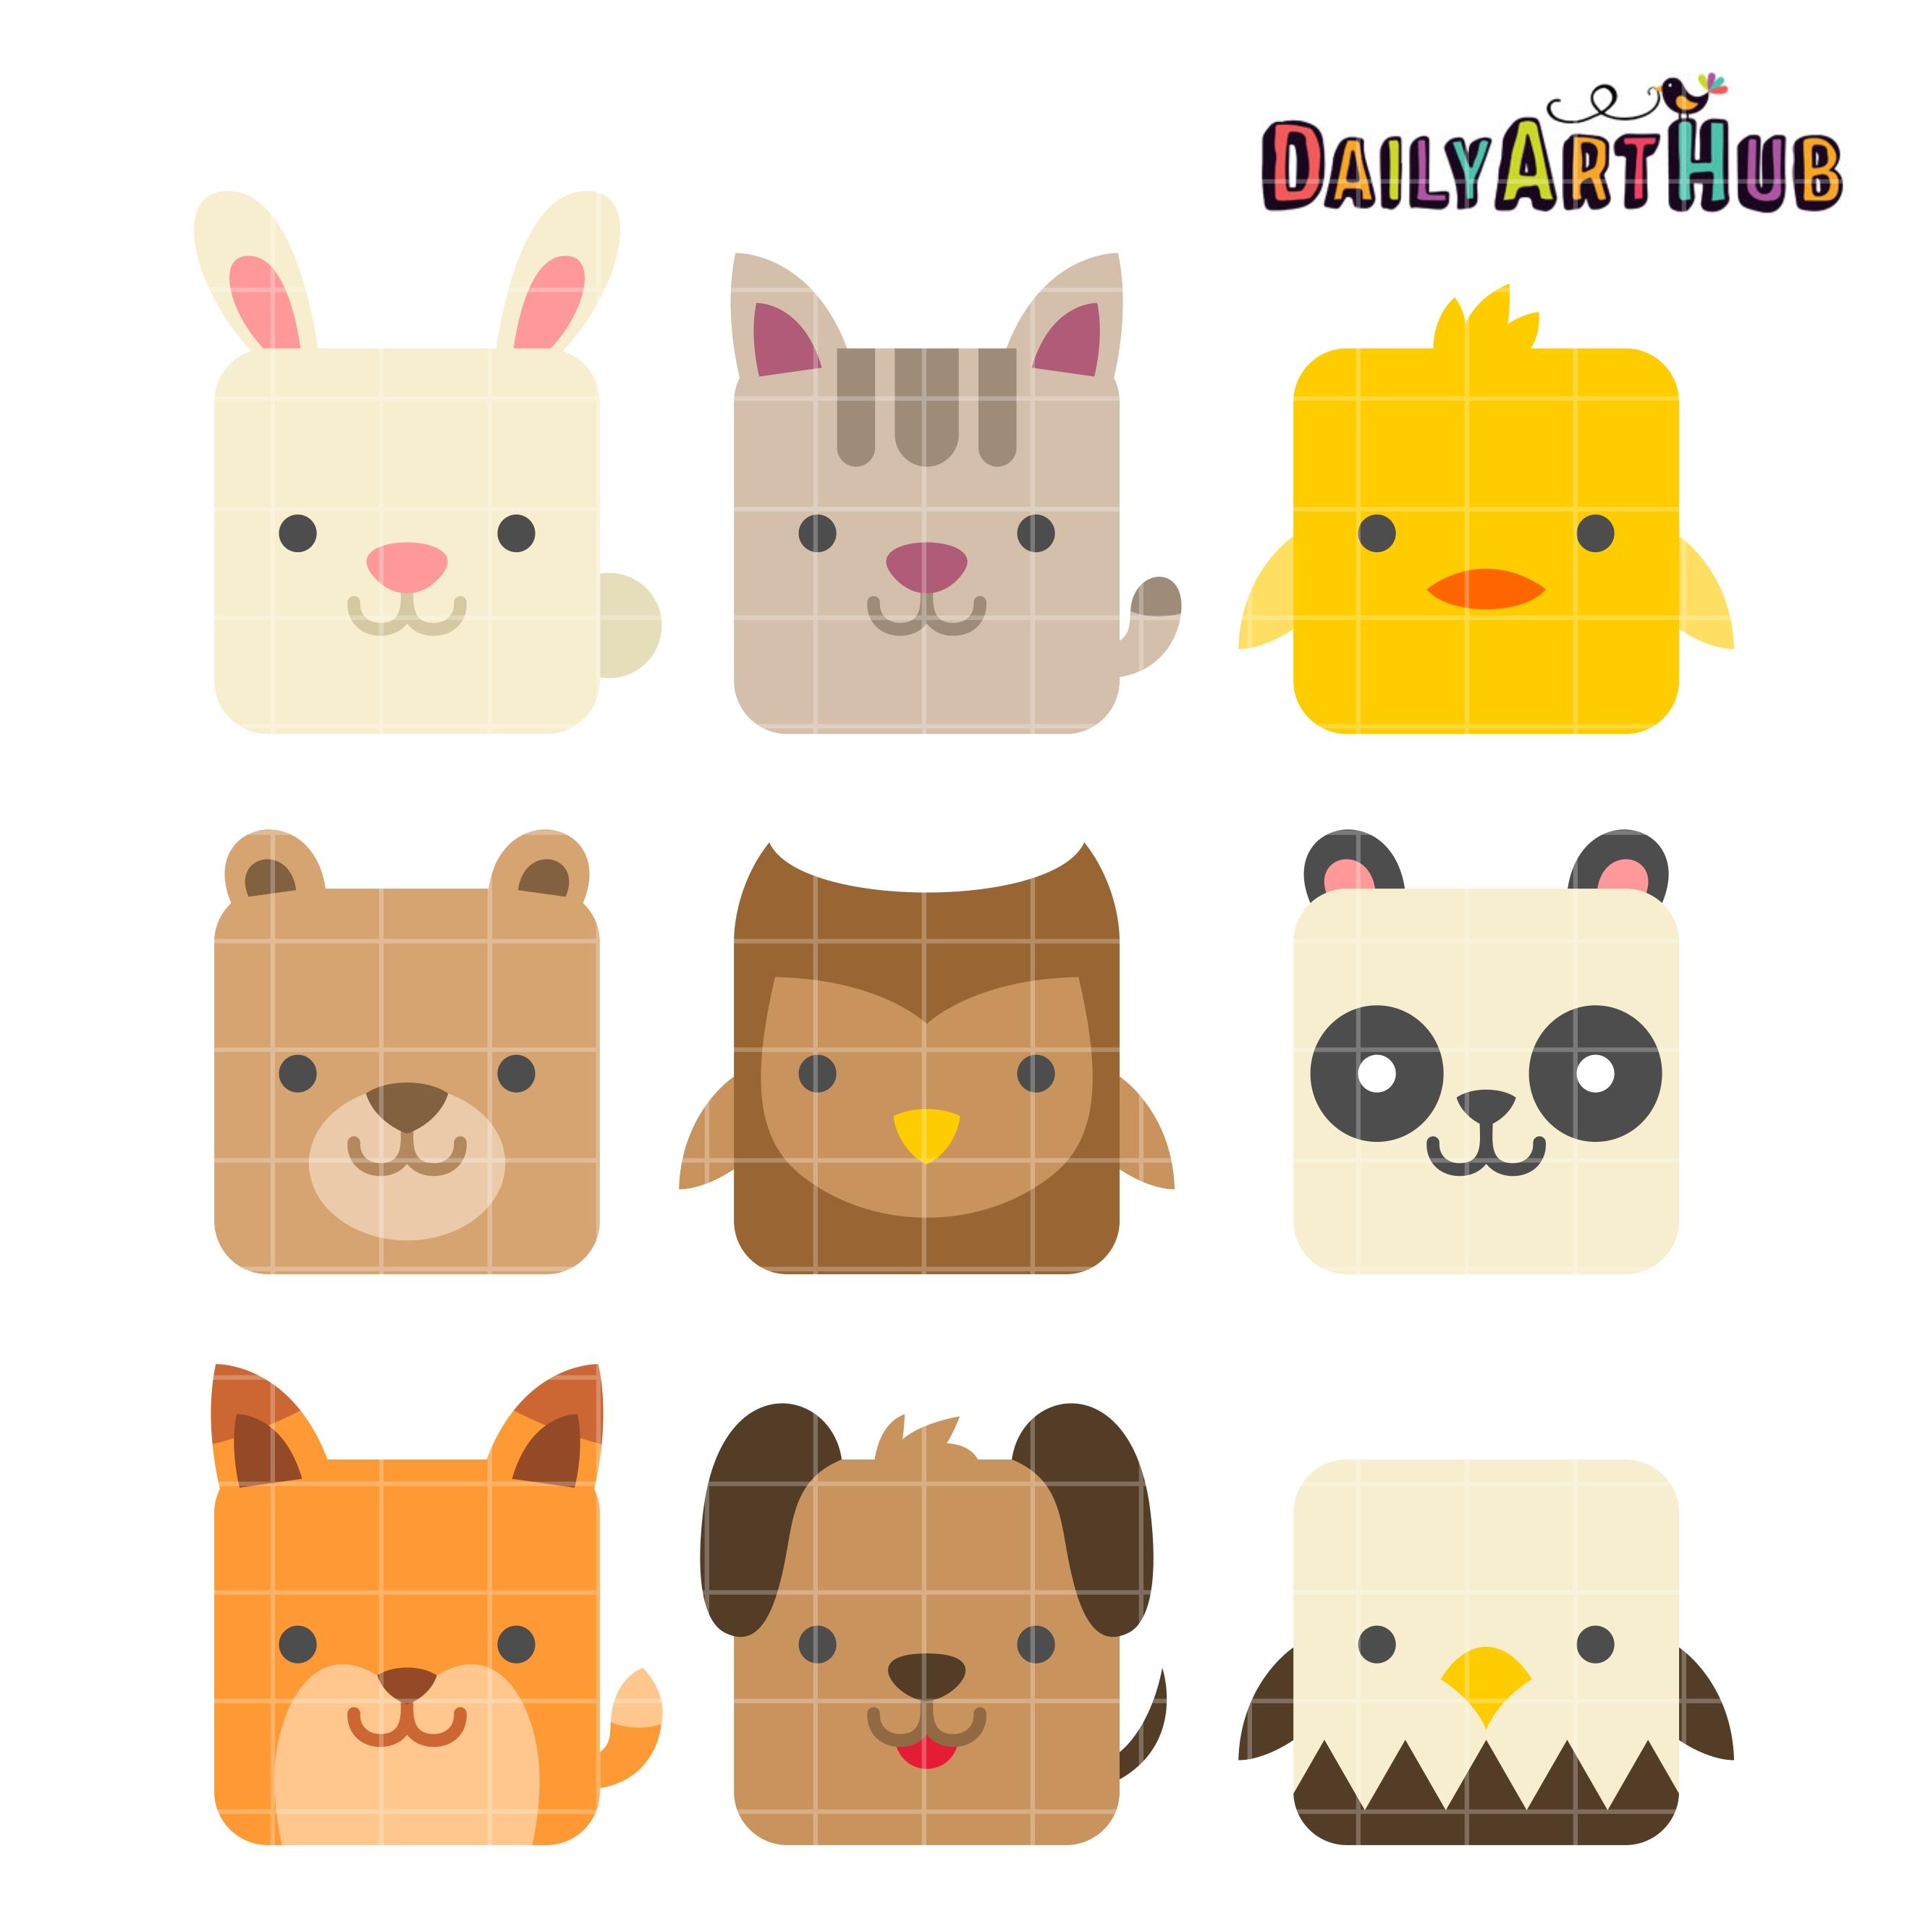 square cute animals clip art set daily art hub free clip art rh dailyarthub com cute animal clipart cute animals clipart